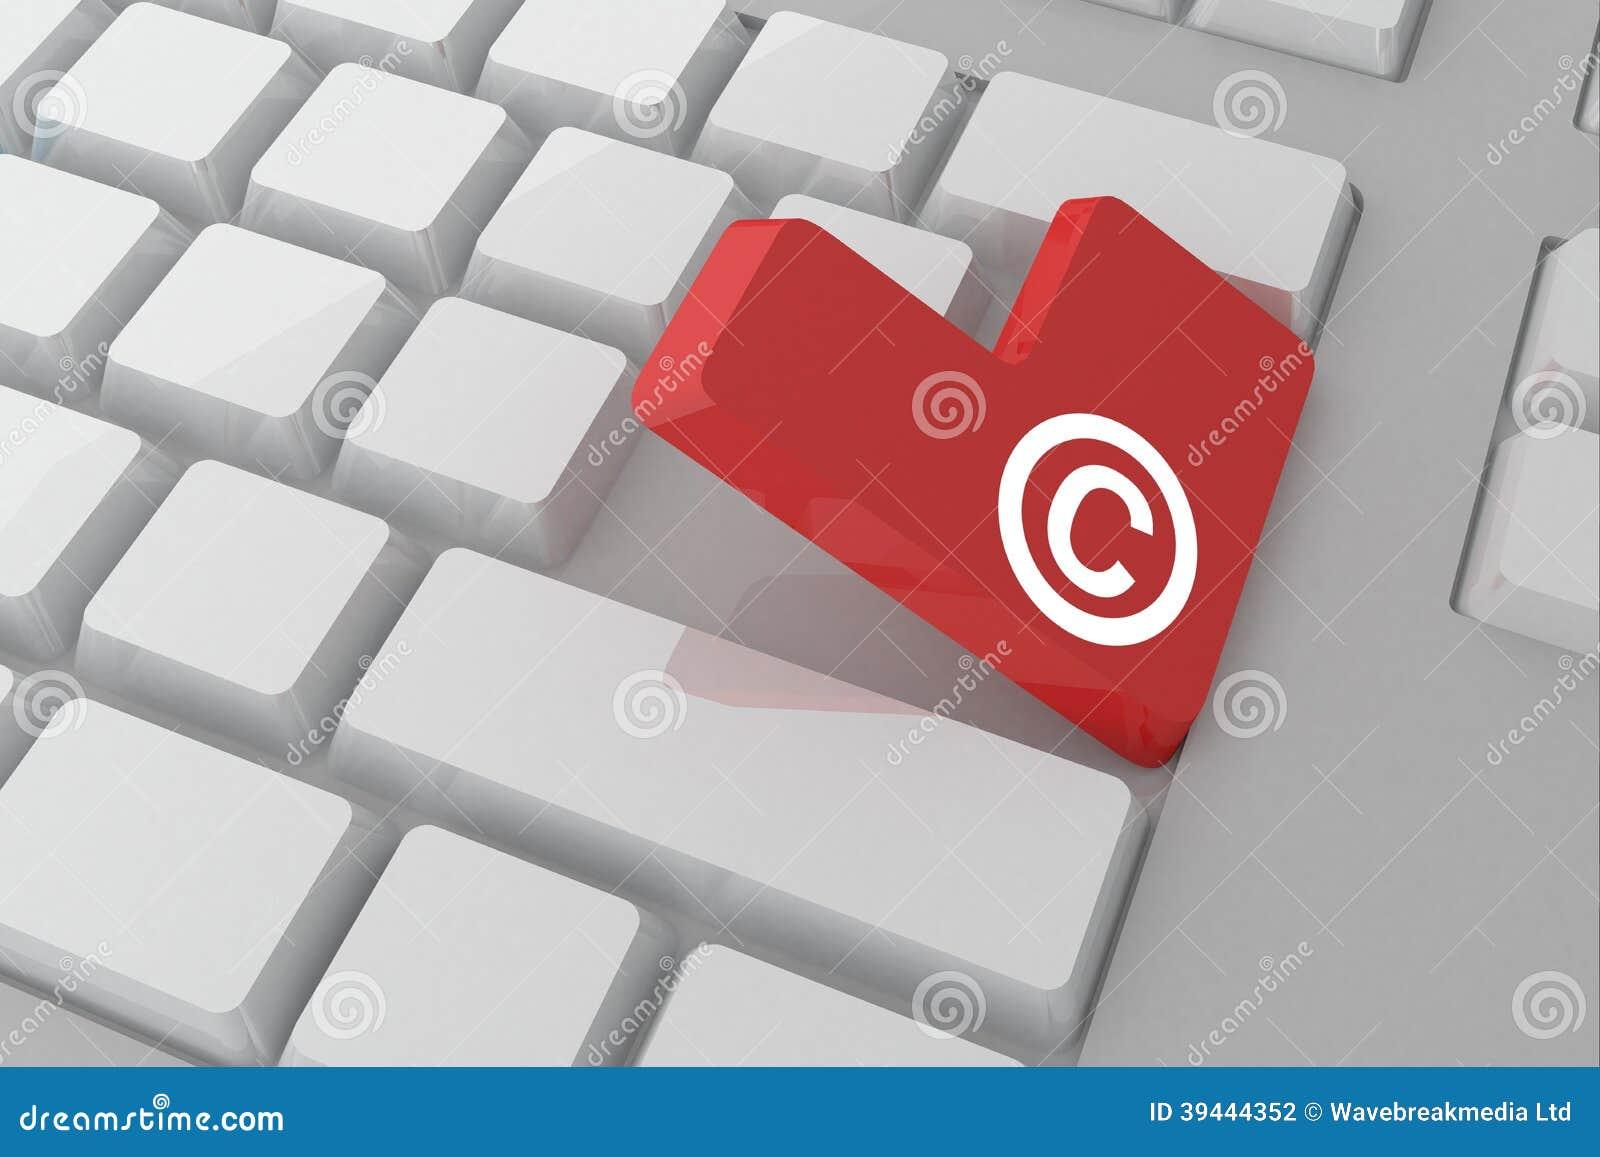 Composite Image Of Copyright Symbol On Key Stock Illustration